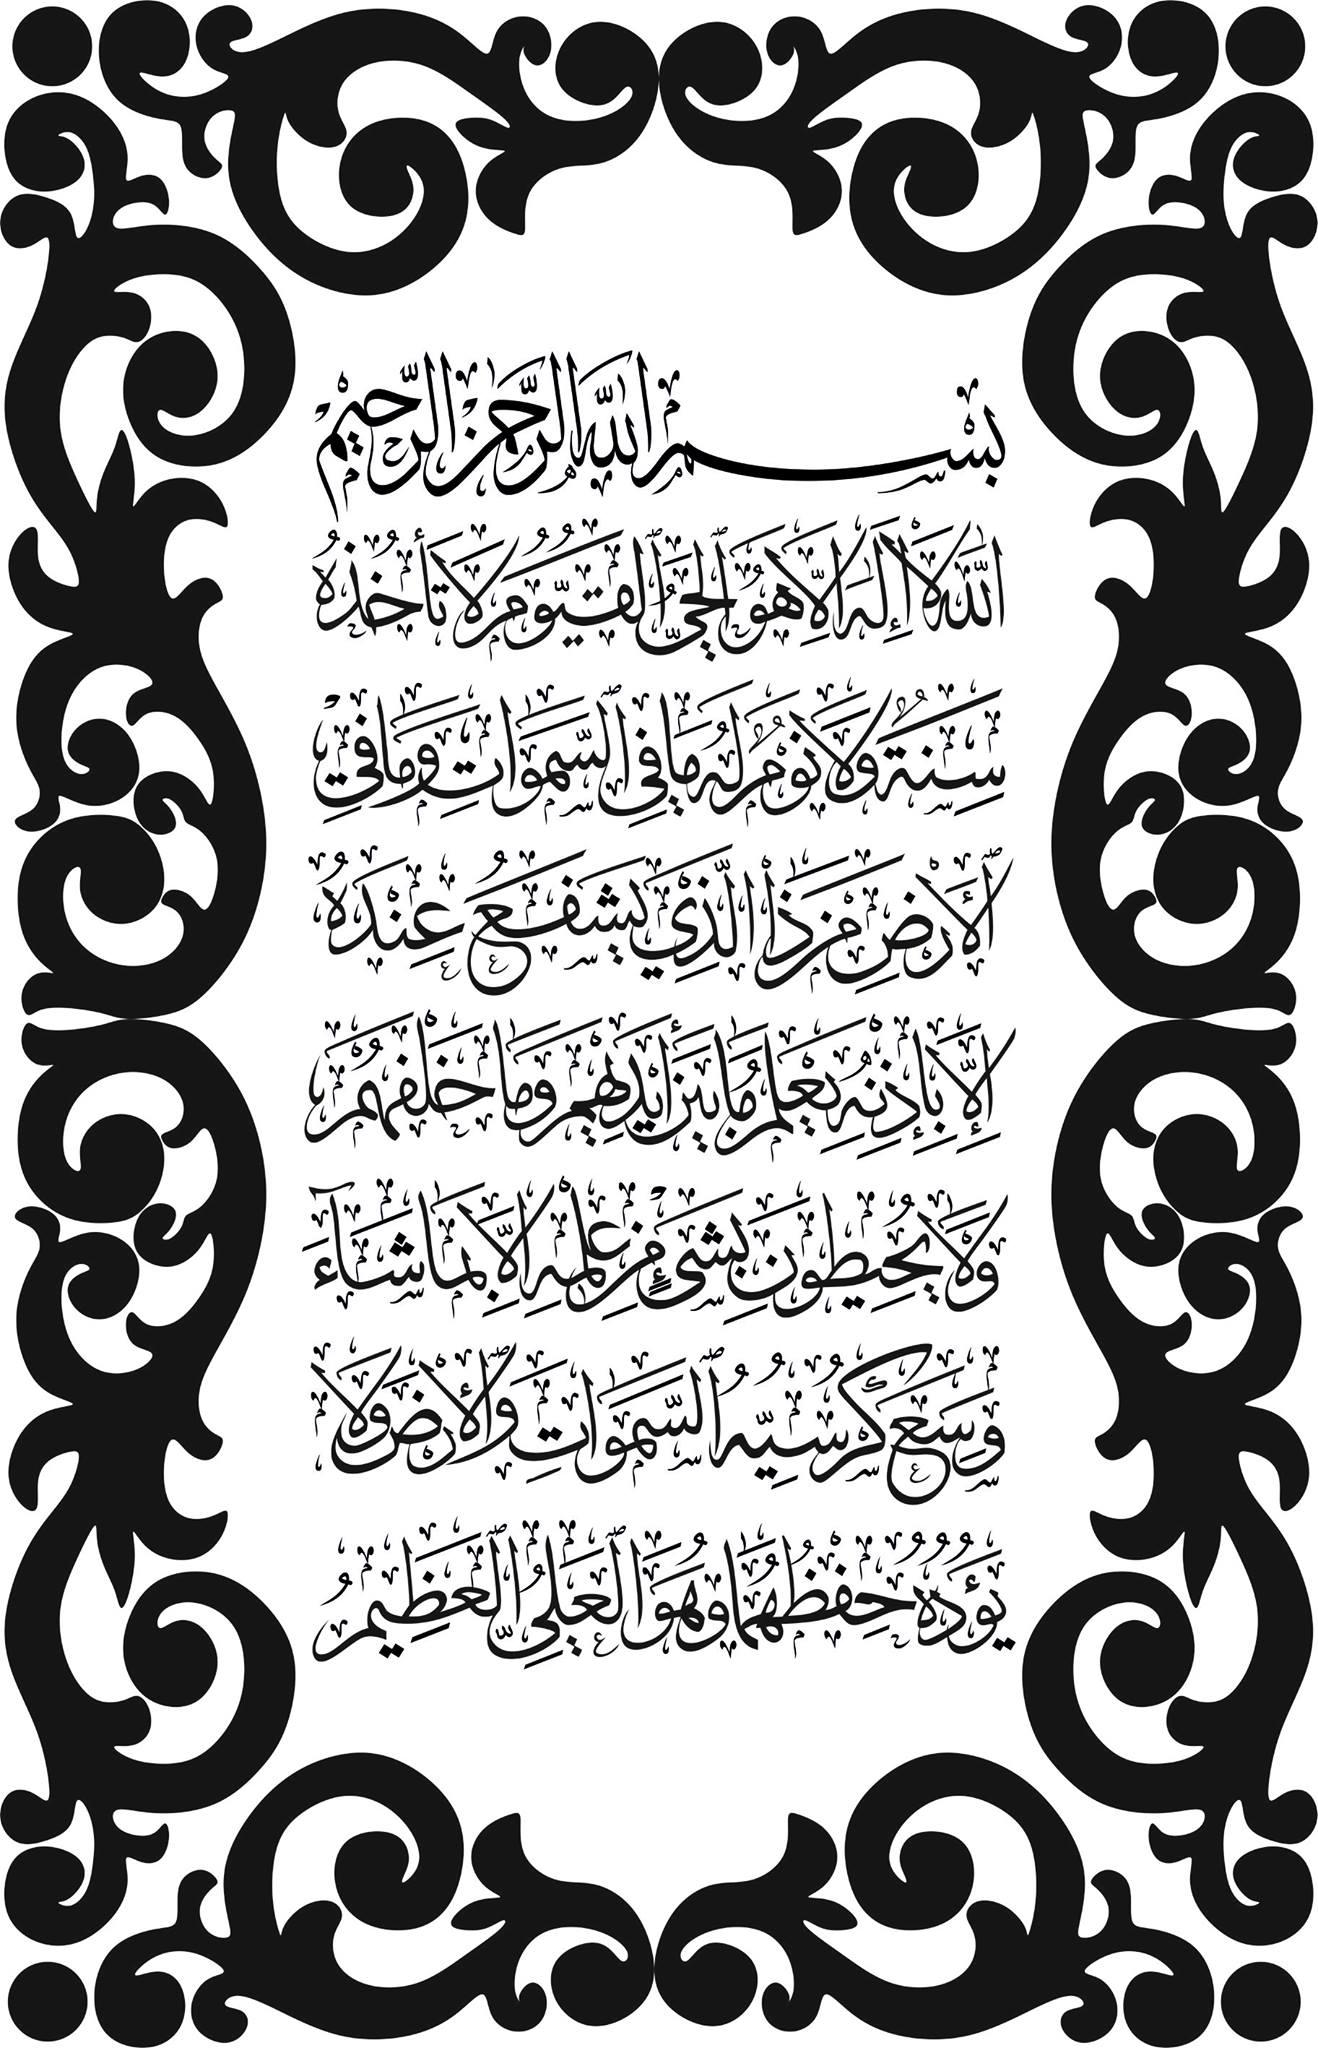 Ayat Kursi Islamic Vector Art jpg Image Free Download.